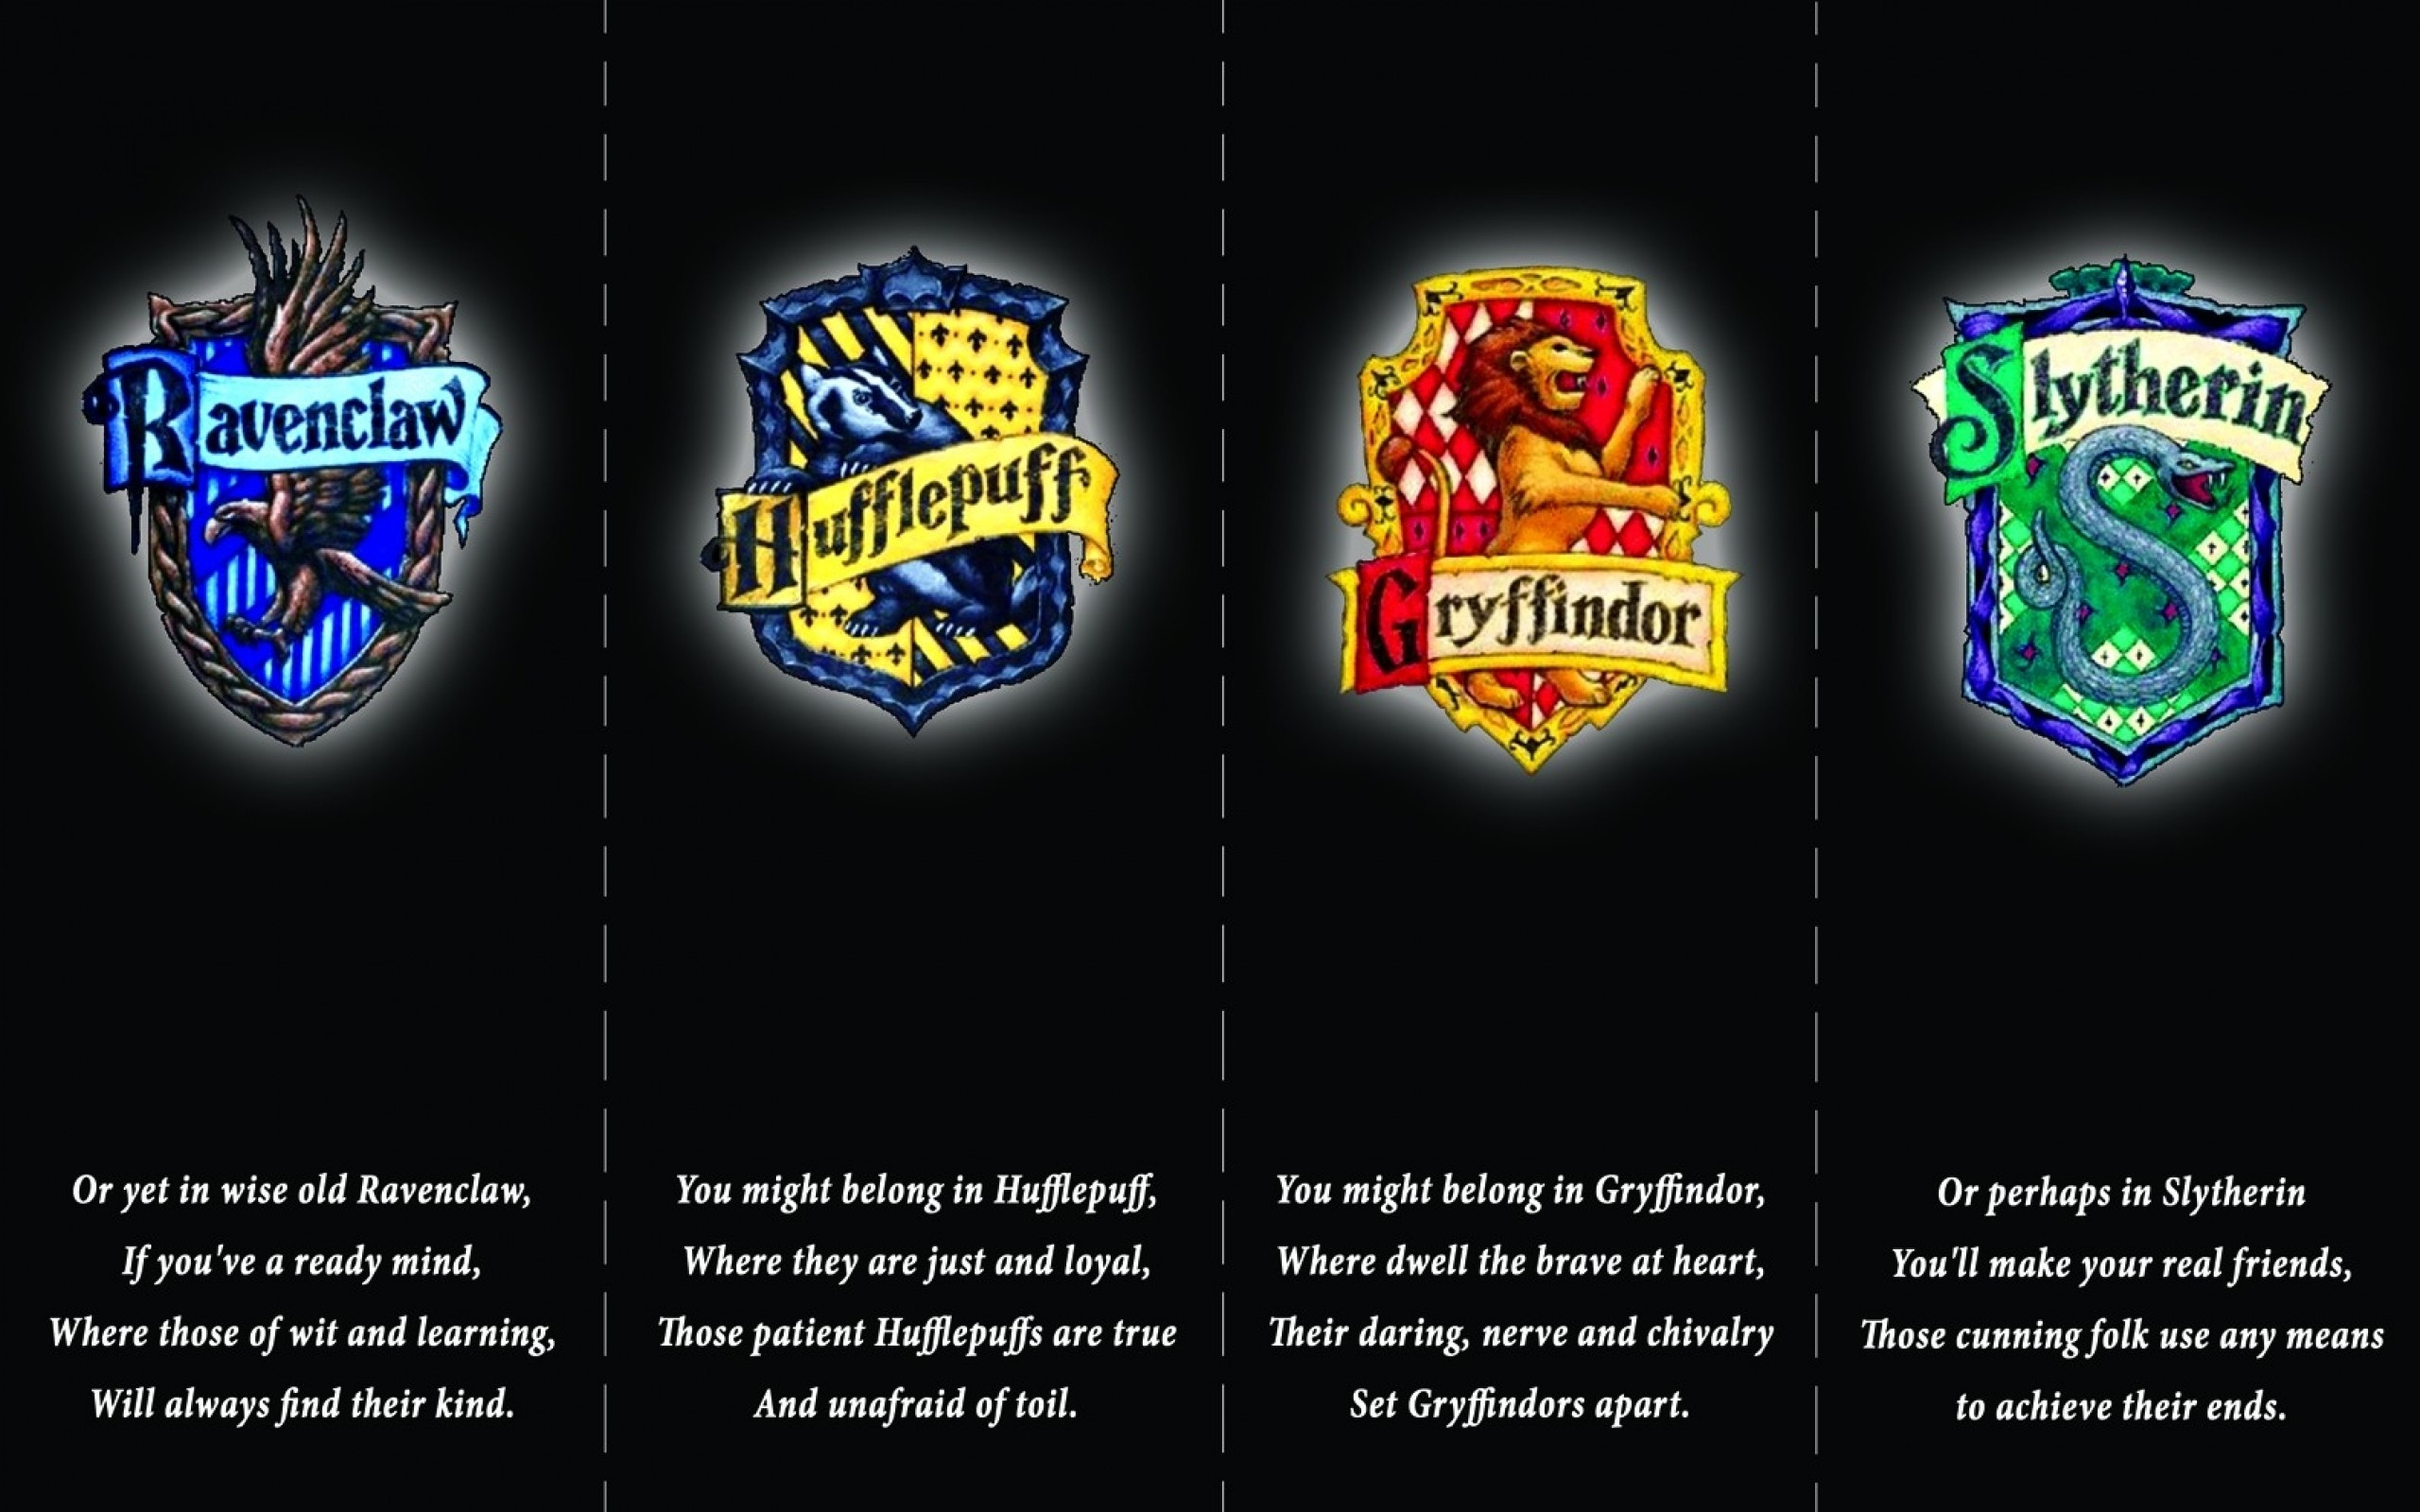 harry potter hufflepuff logos gryffindor hogwarts slytherin ravenclaw  1584×1049 wallpaper Art HD Wallpaper